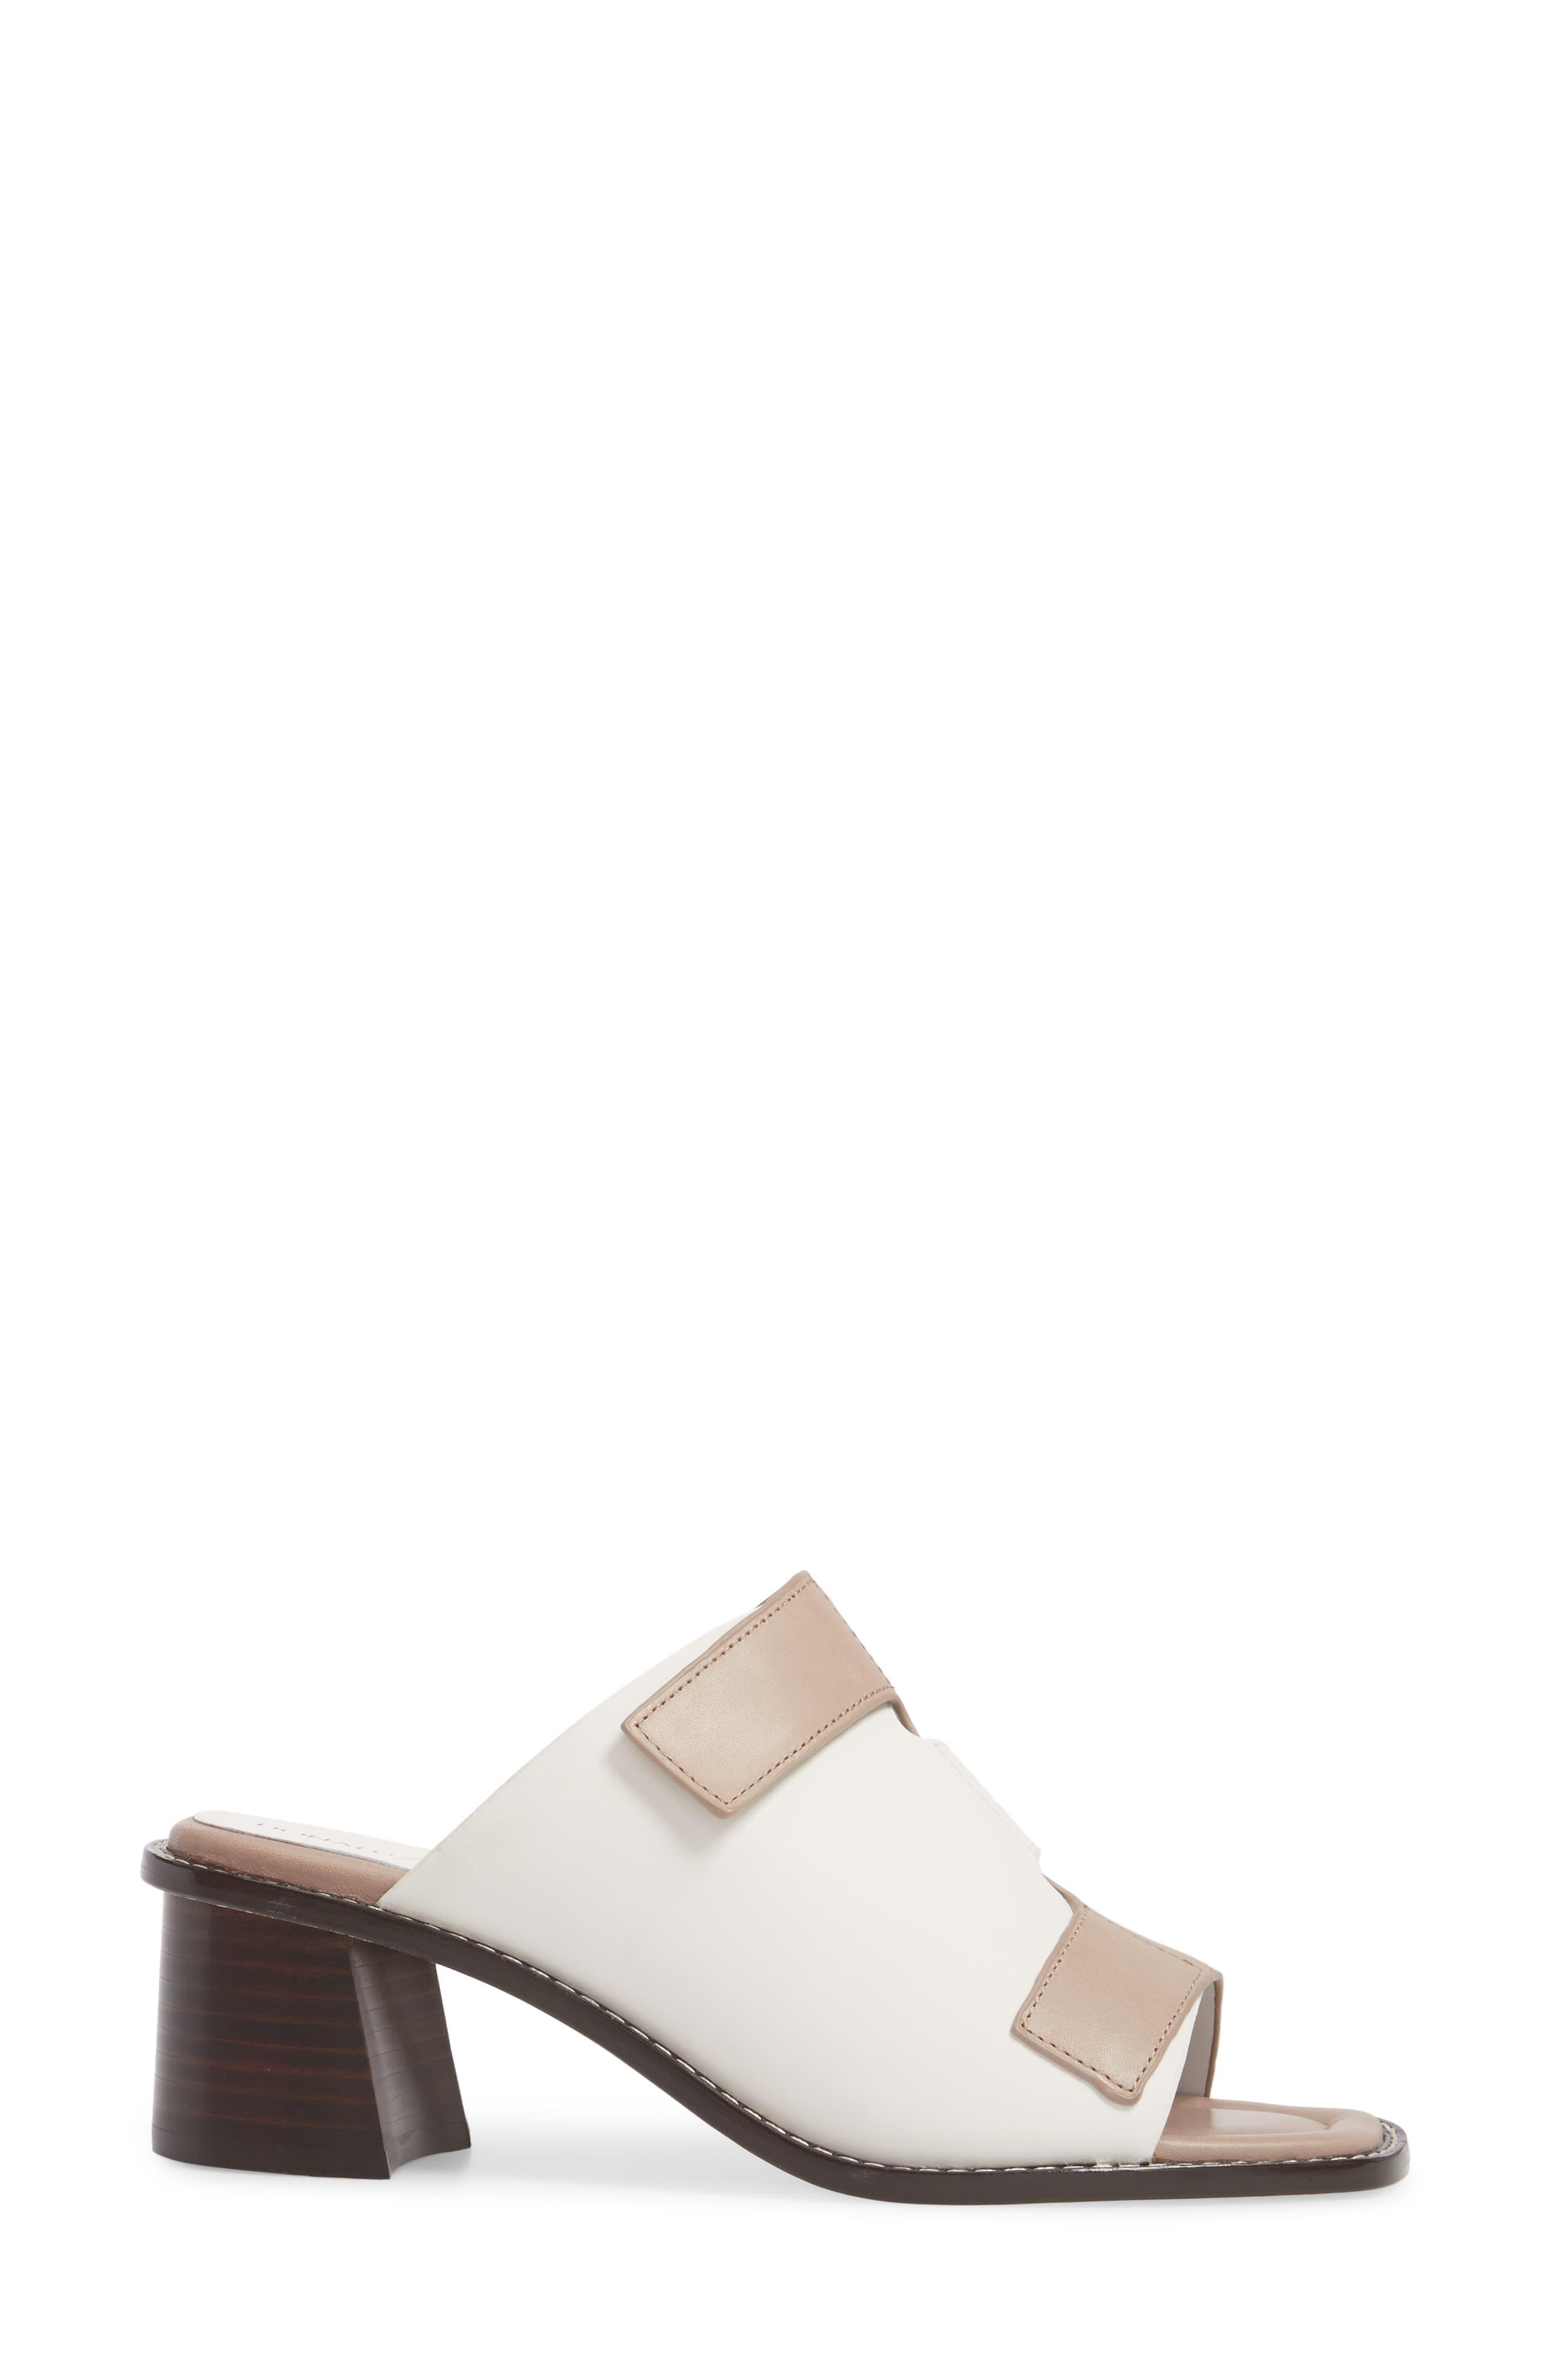 Amalia Block Heel Sandal,                             Alternate thumbnail 3, color,                             Bone Leather